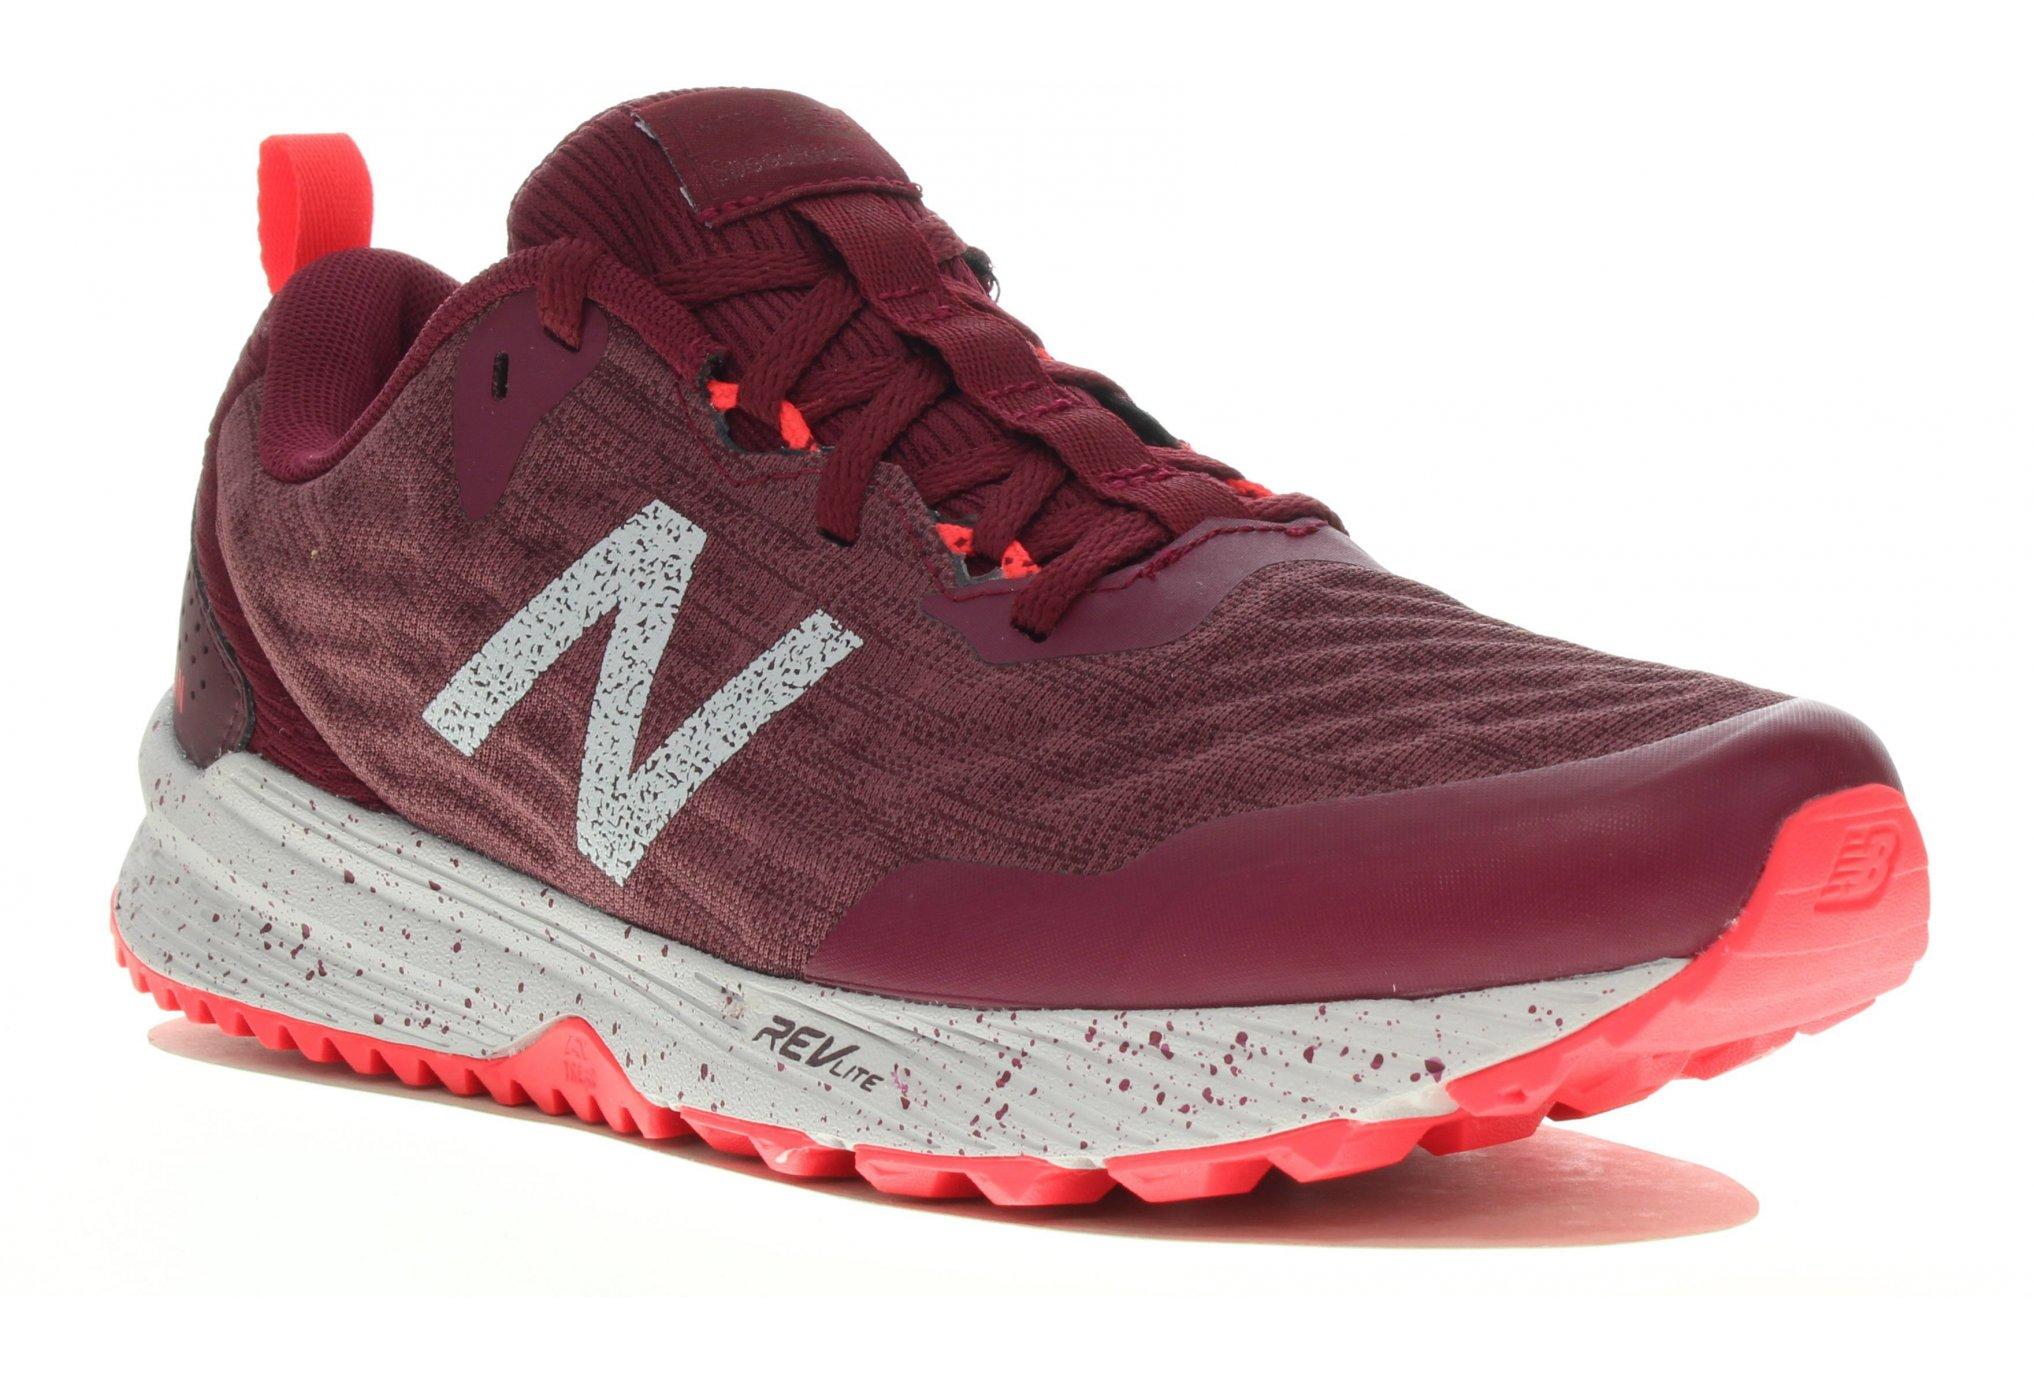 New Balance Nitrel V3 Chaussures running femme